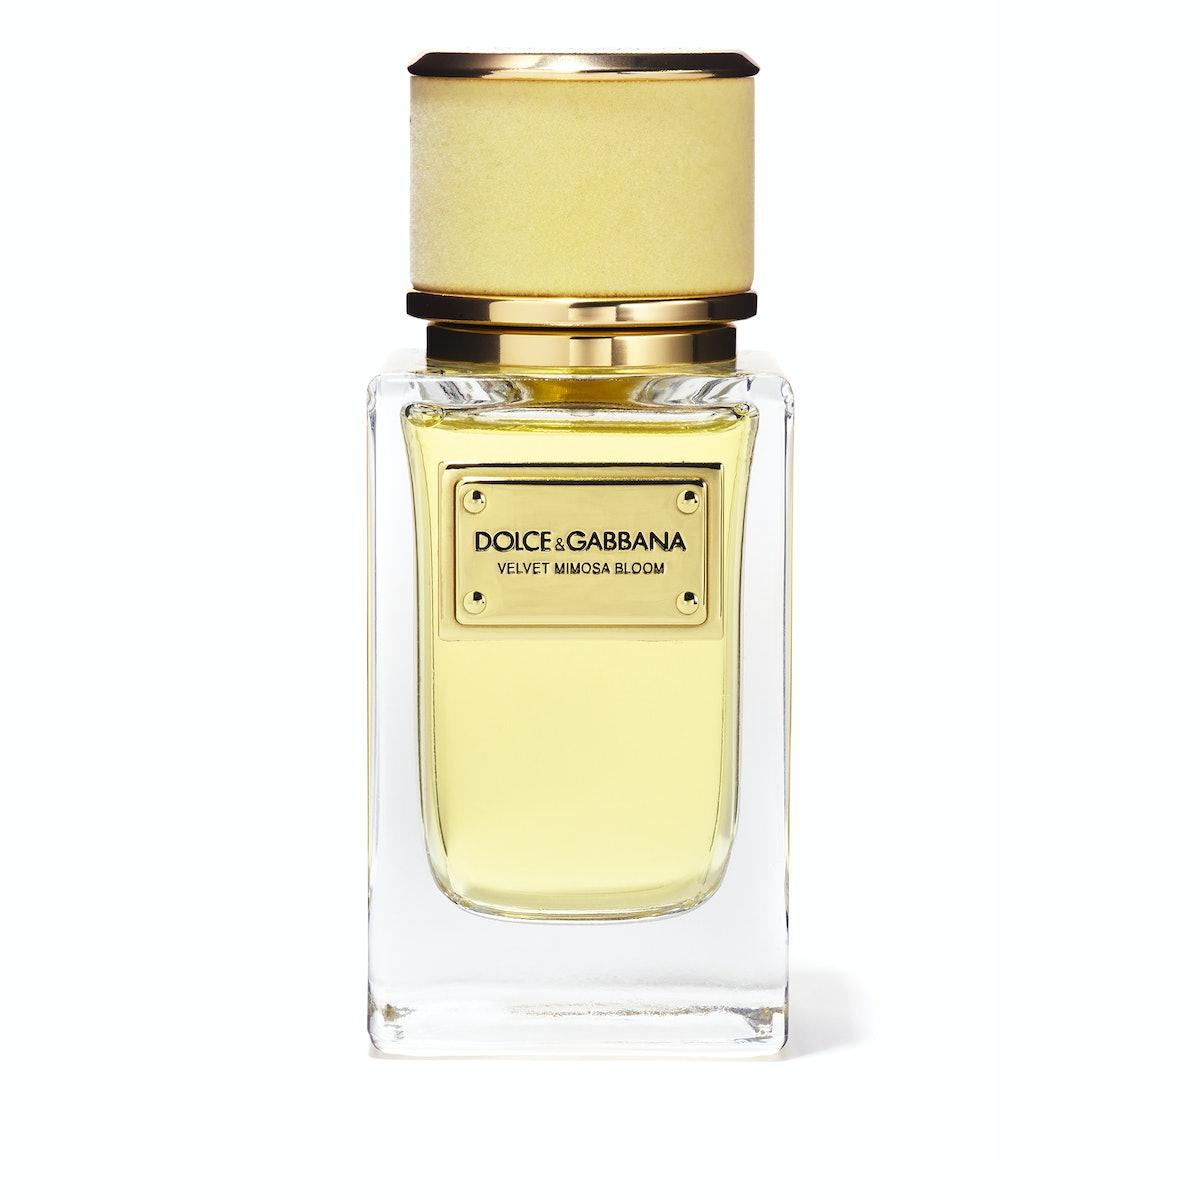 Dolce & Gabbana Velvet Mimosa Bloom eau de parfum